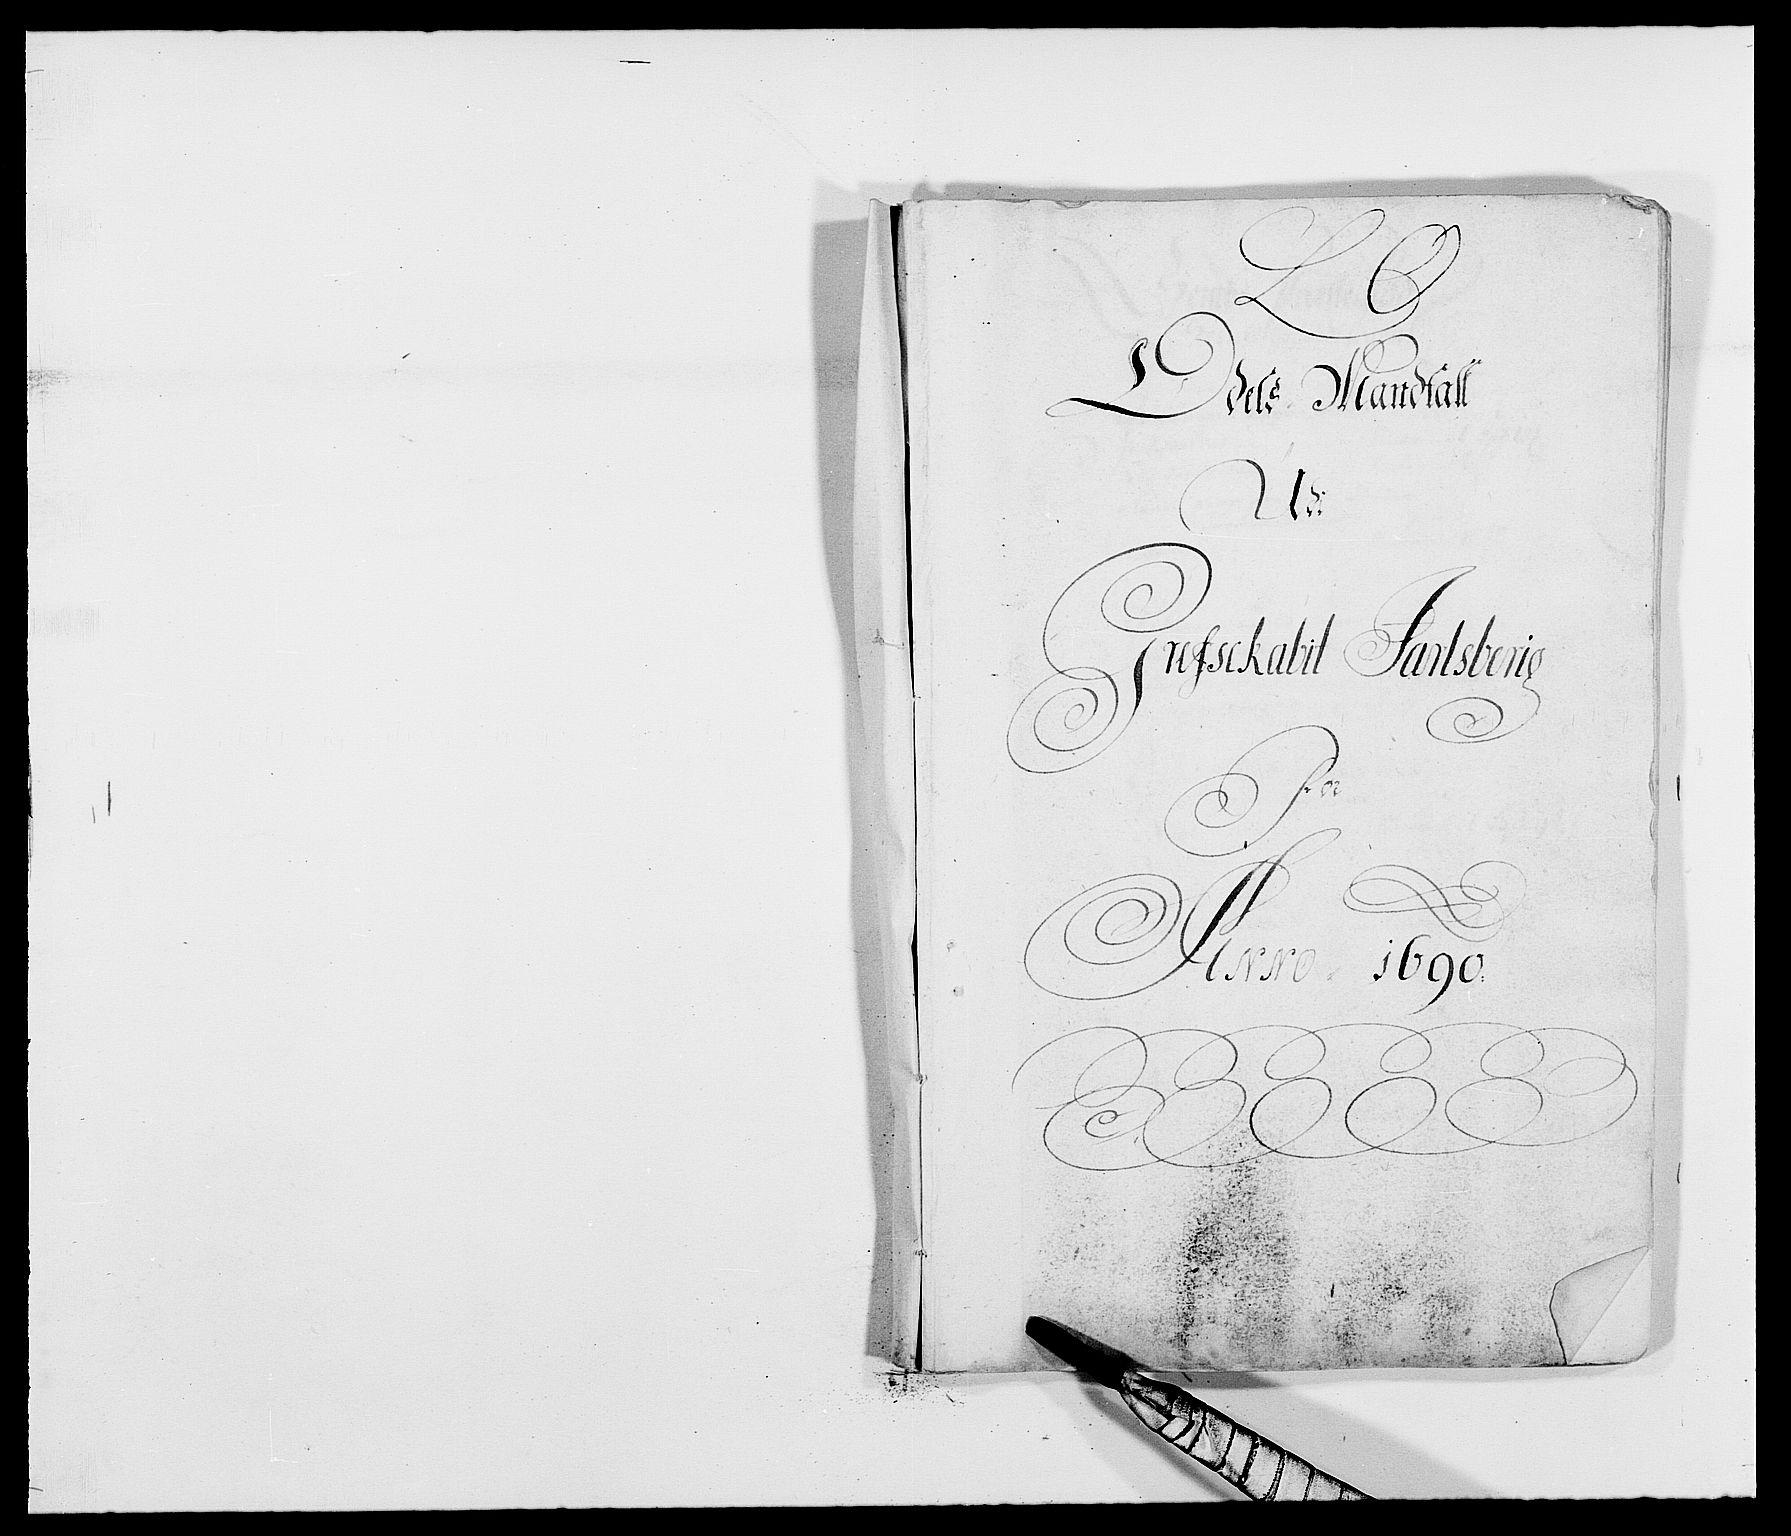 RA, Rentekammeret inntil 1814, Reviderte regnskaper, Fogderegnskap, R32/L1861: Fogderegnskap Jarlsberg grevskap, 1686-1690, s. 145